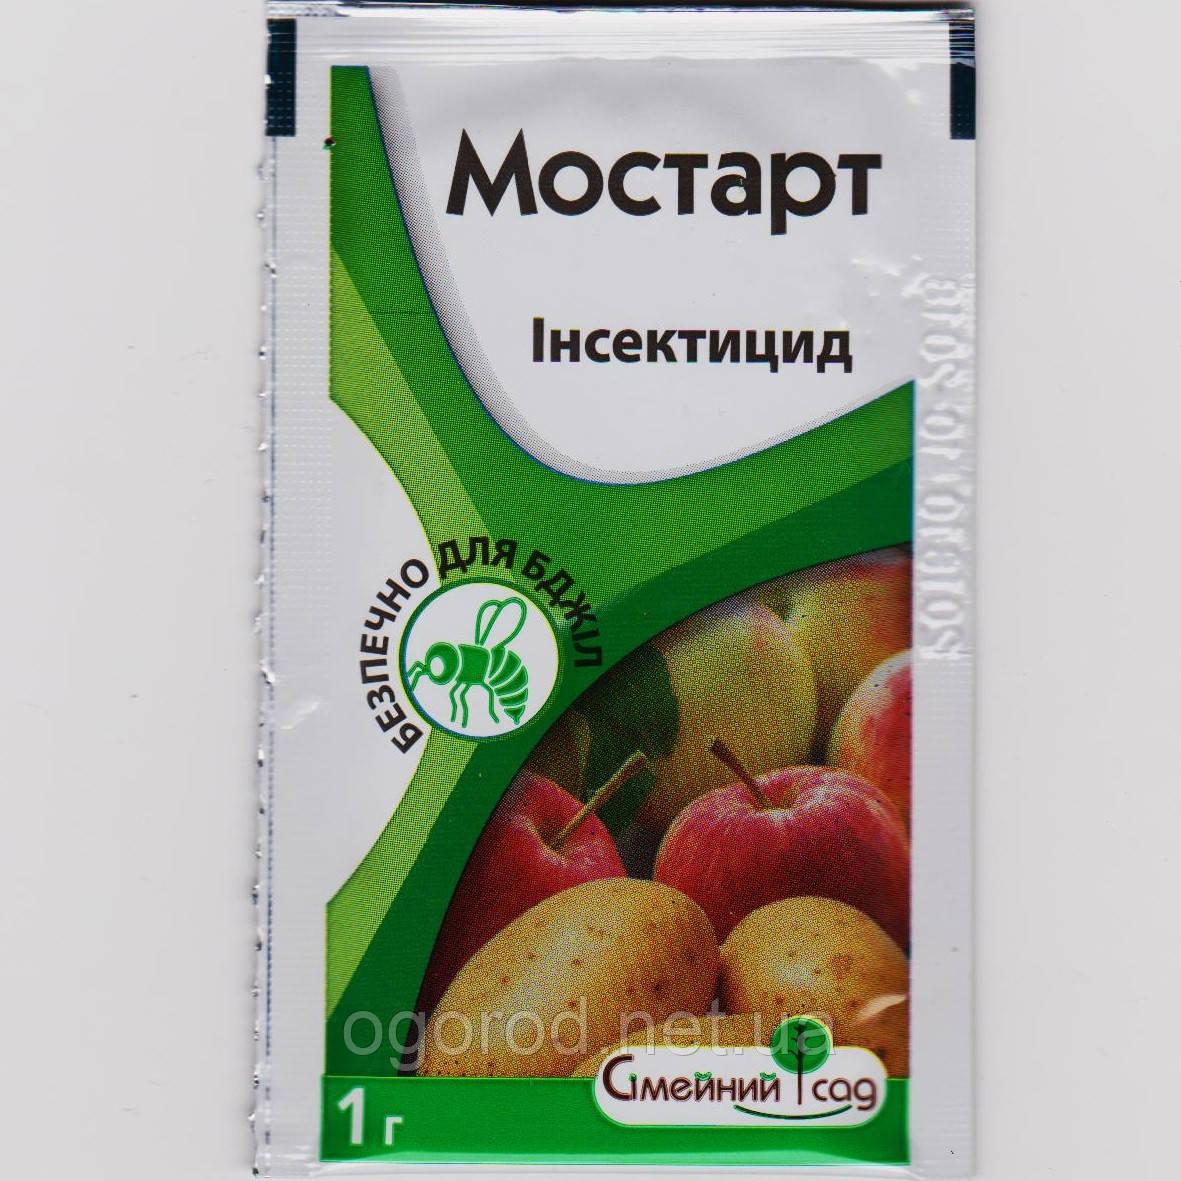 Мостарт аналог Моспилана, Украина